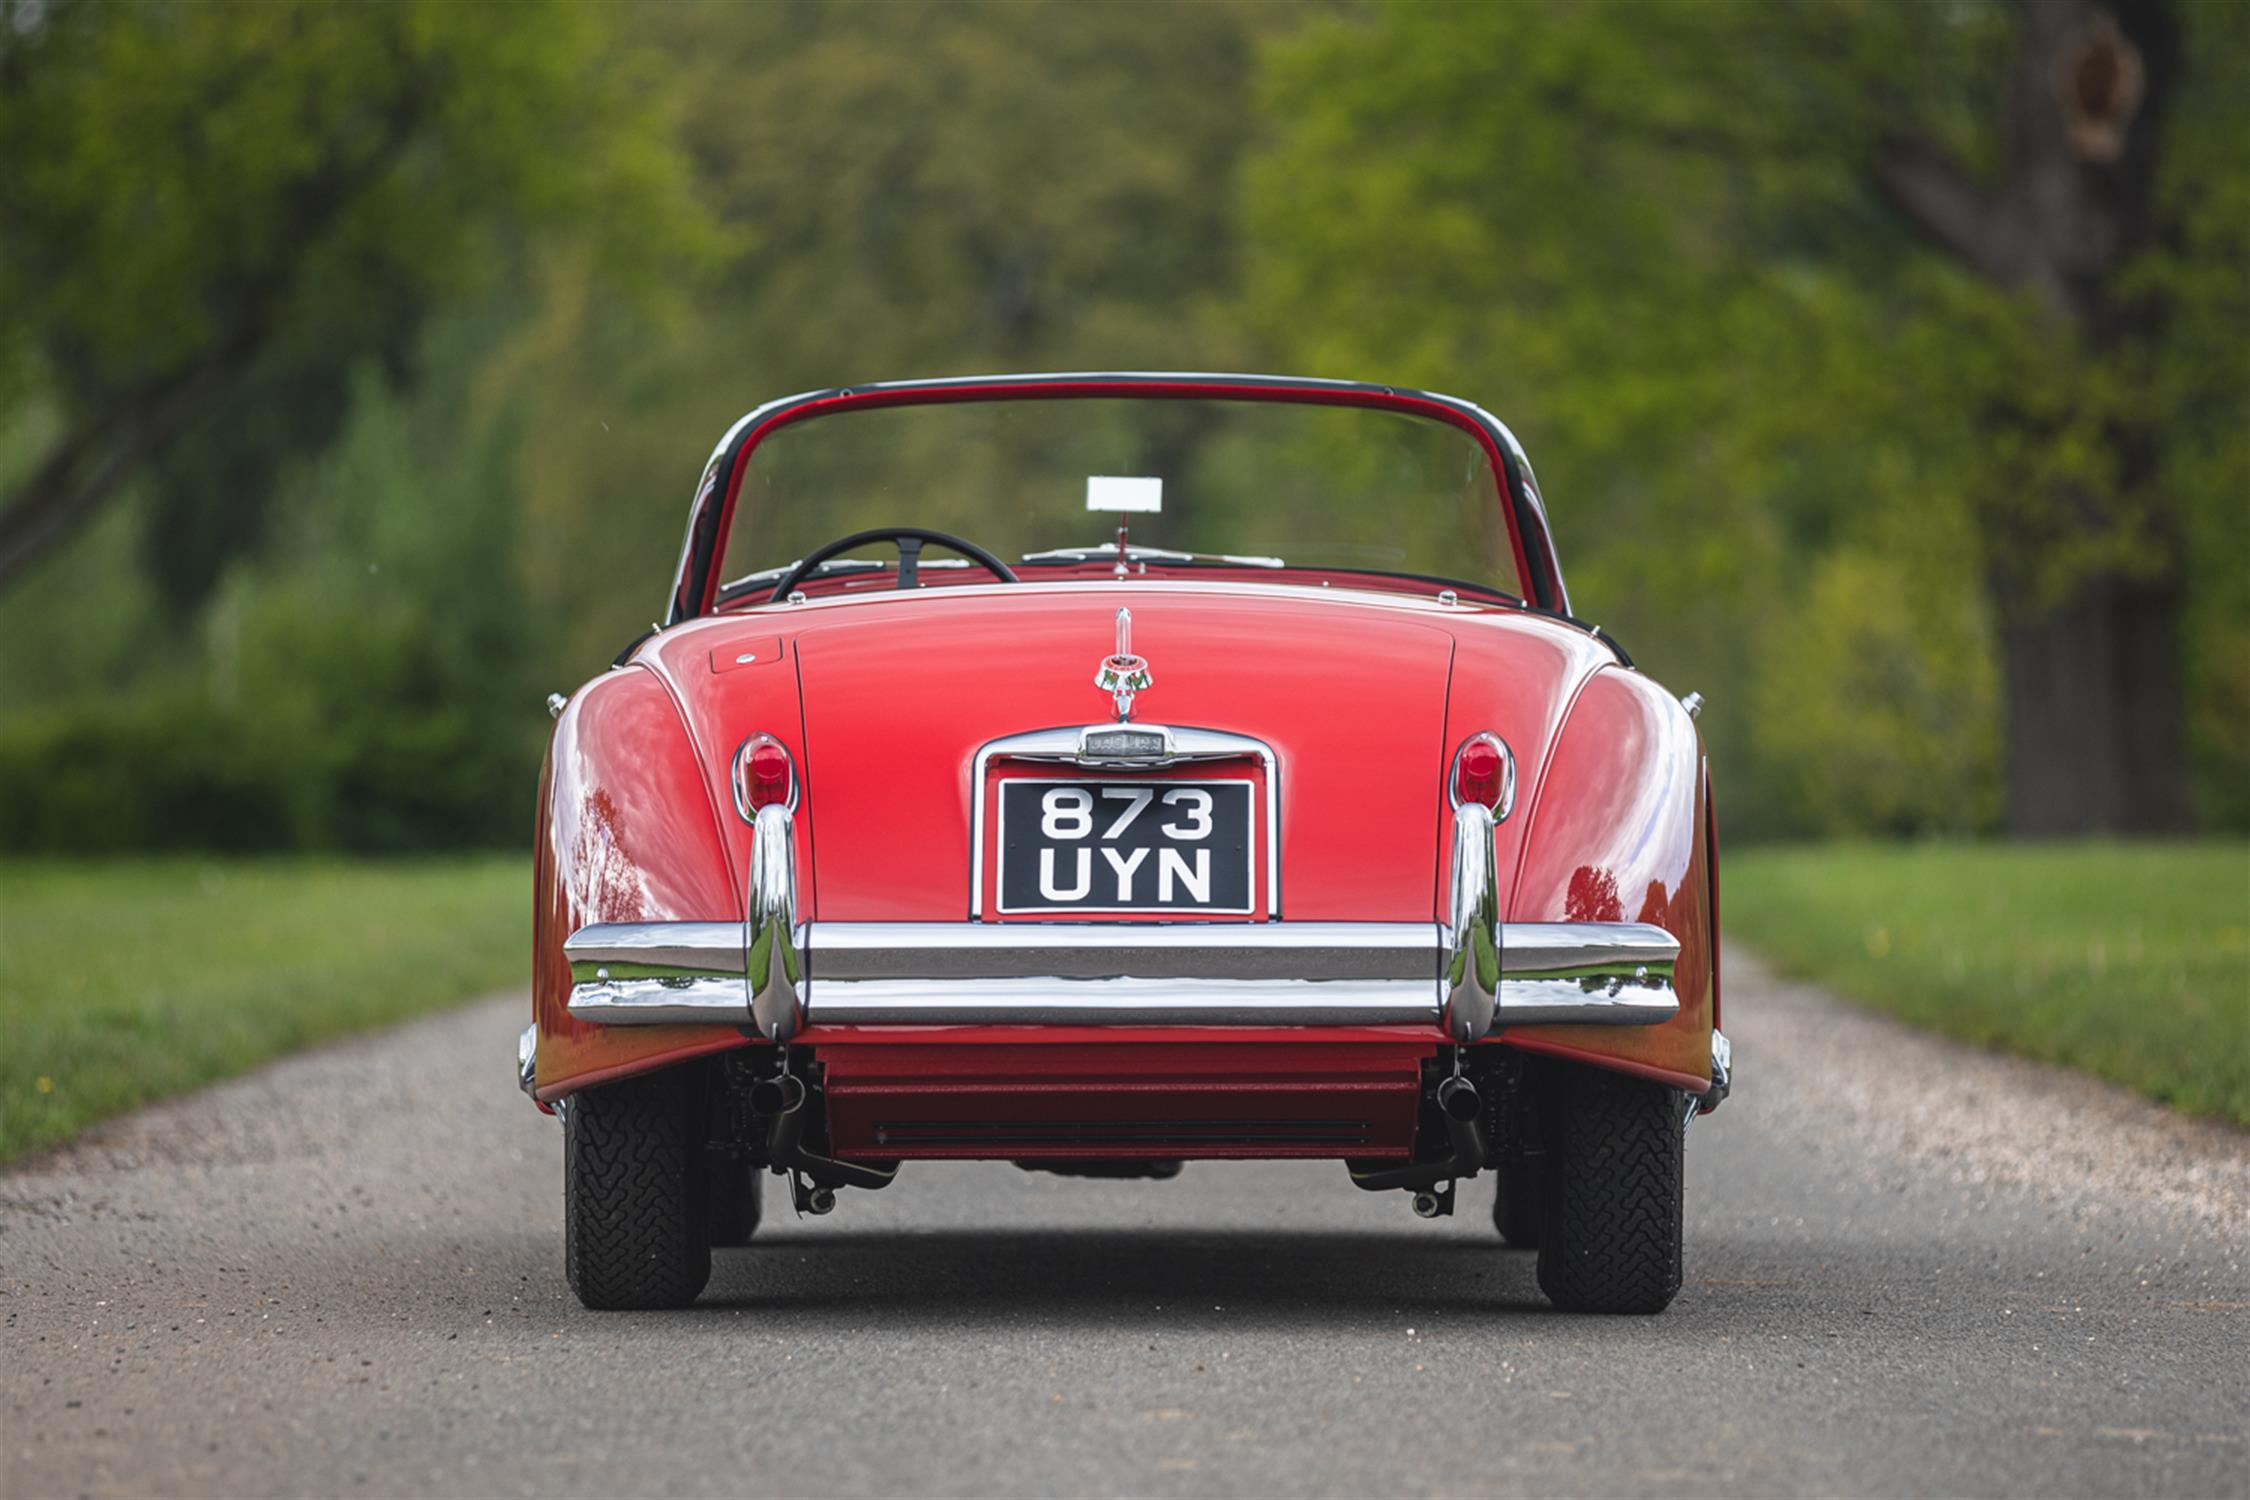 1958 Jaguar XK150 3.4-Litre 'S' Roadster (LHD) - Image 7 of 10